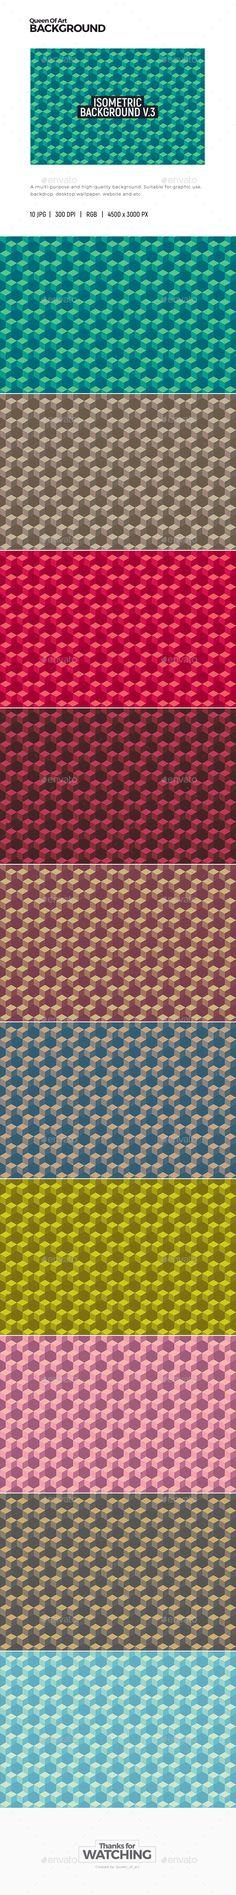 pin by bashooka web  u0026 graphic design on background